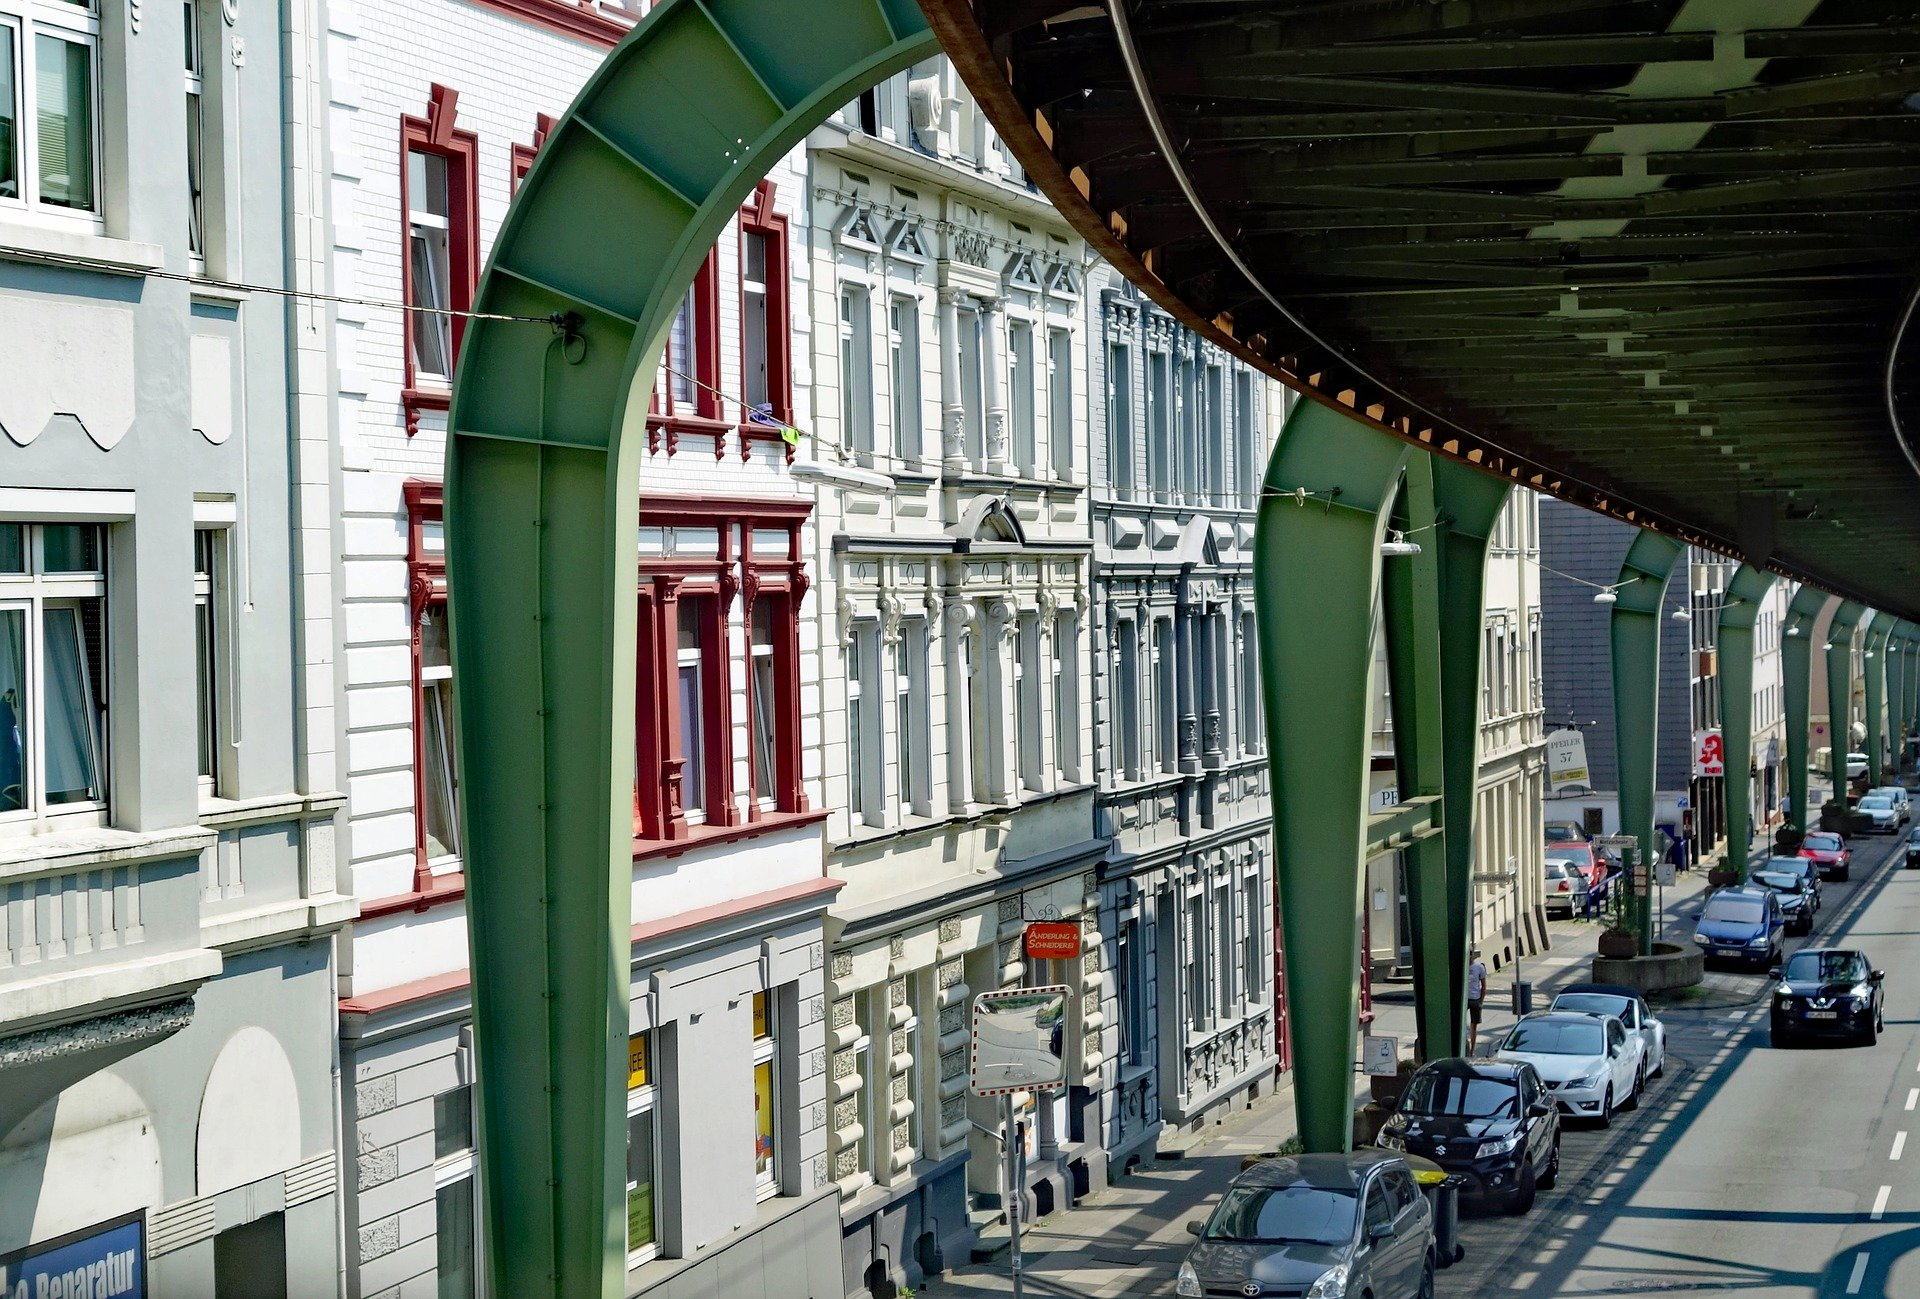 Schwebebahn in Wuppertal vor Hausfassaden